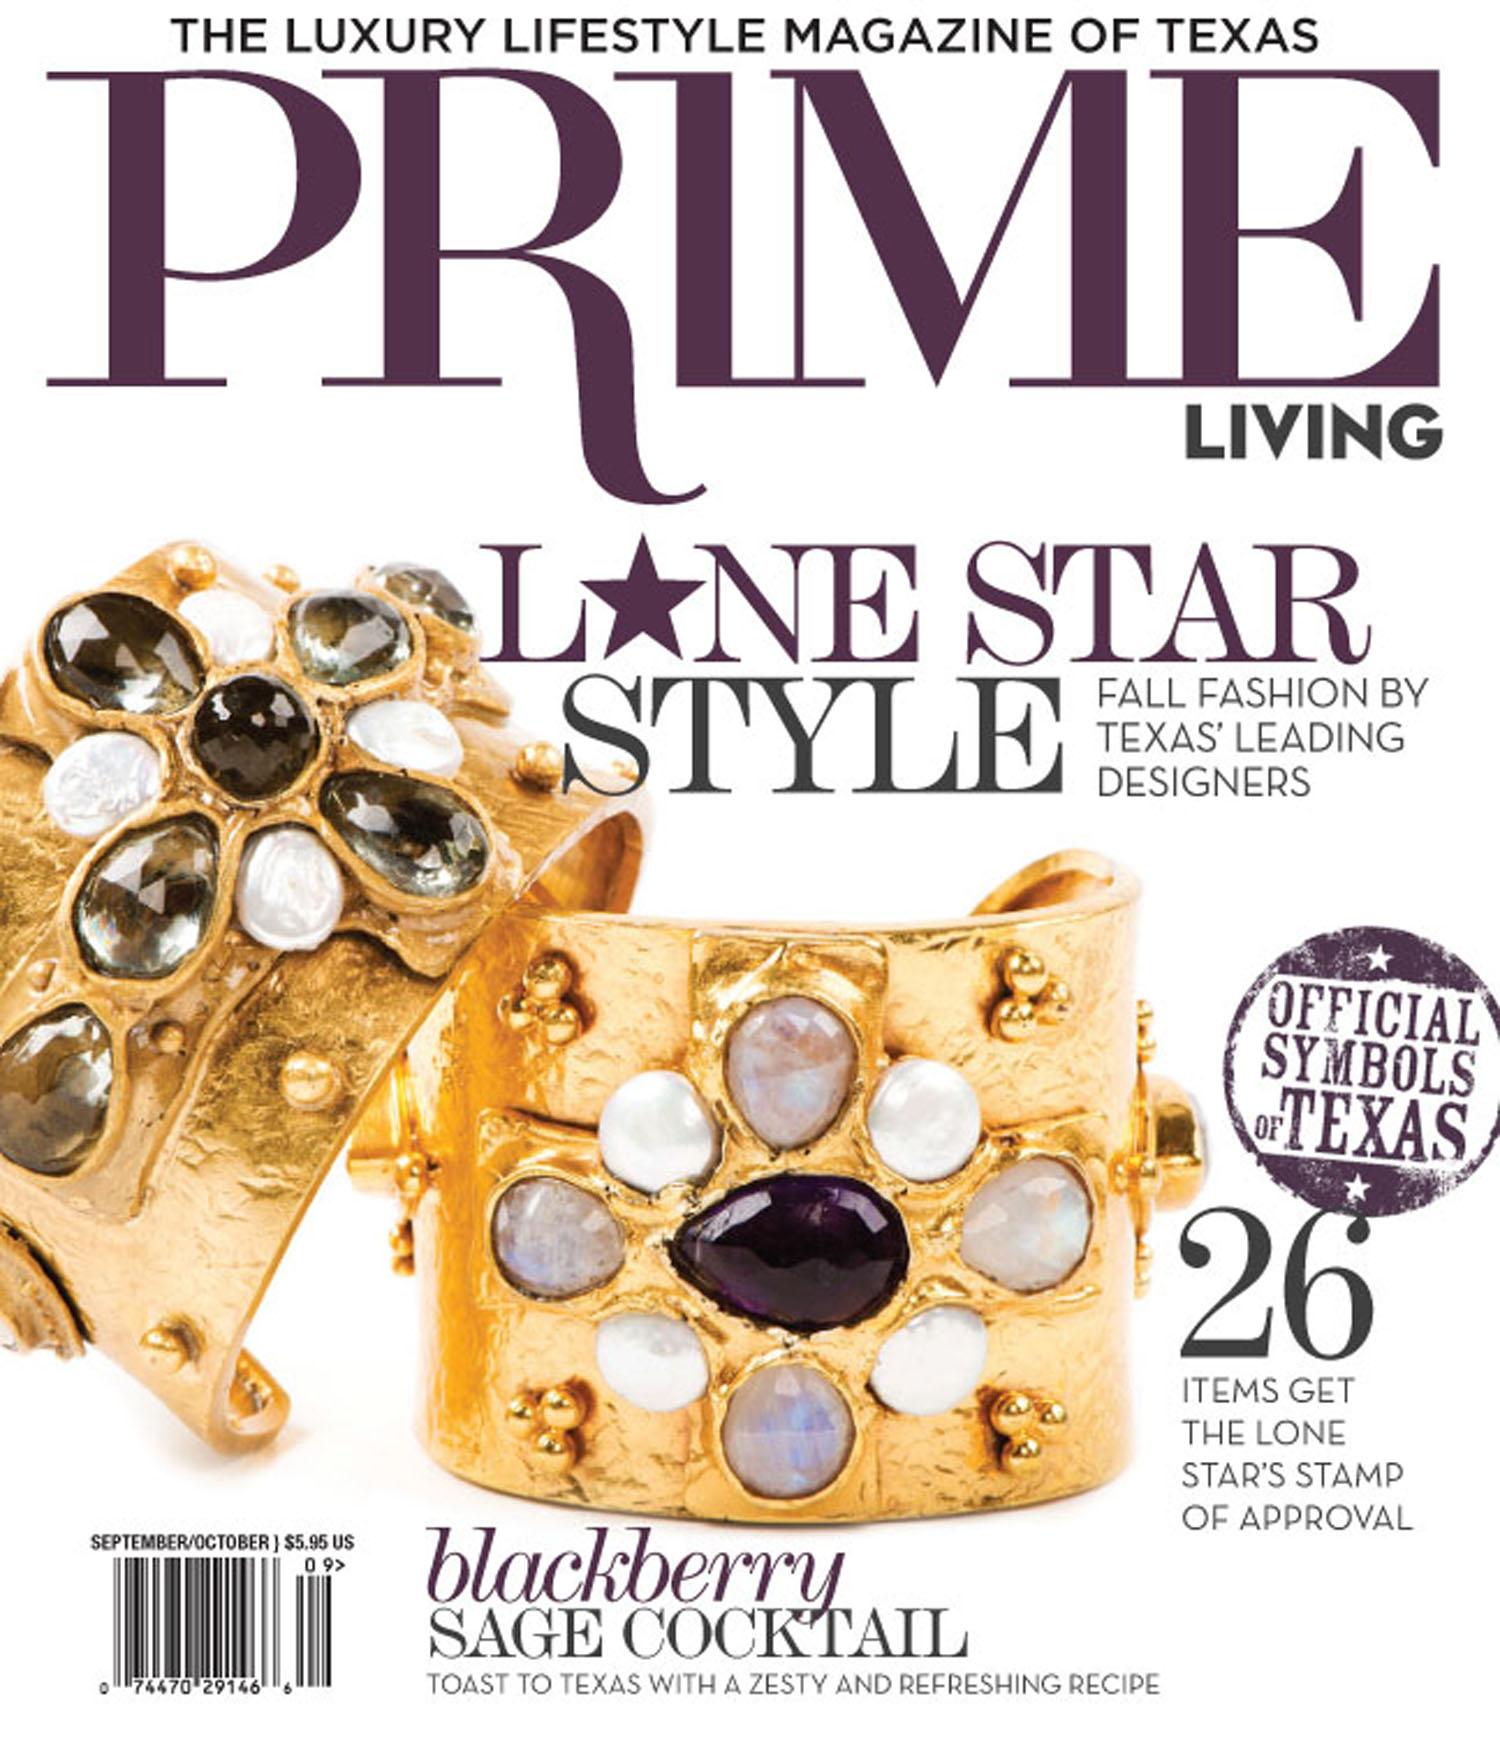 2014 SEP OCT PRIME LIVING COVER.jpg